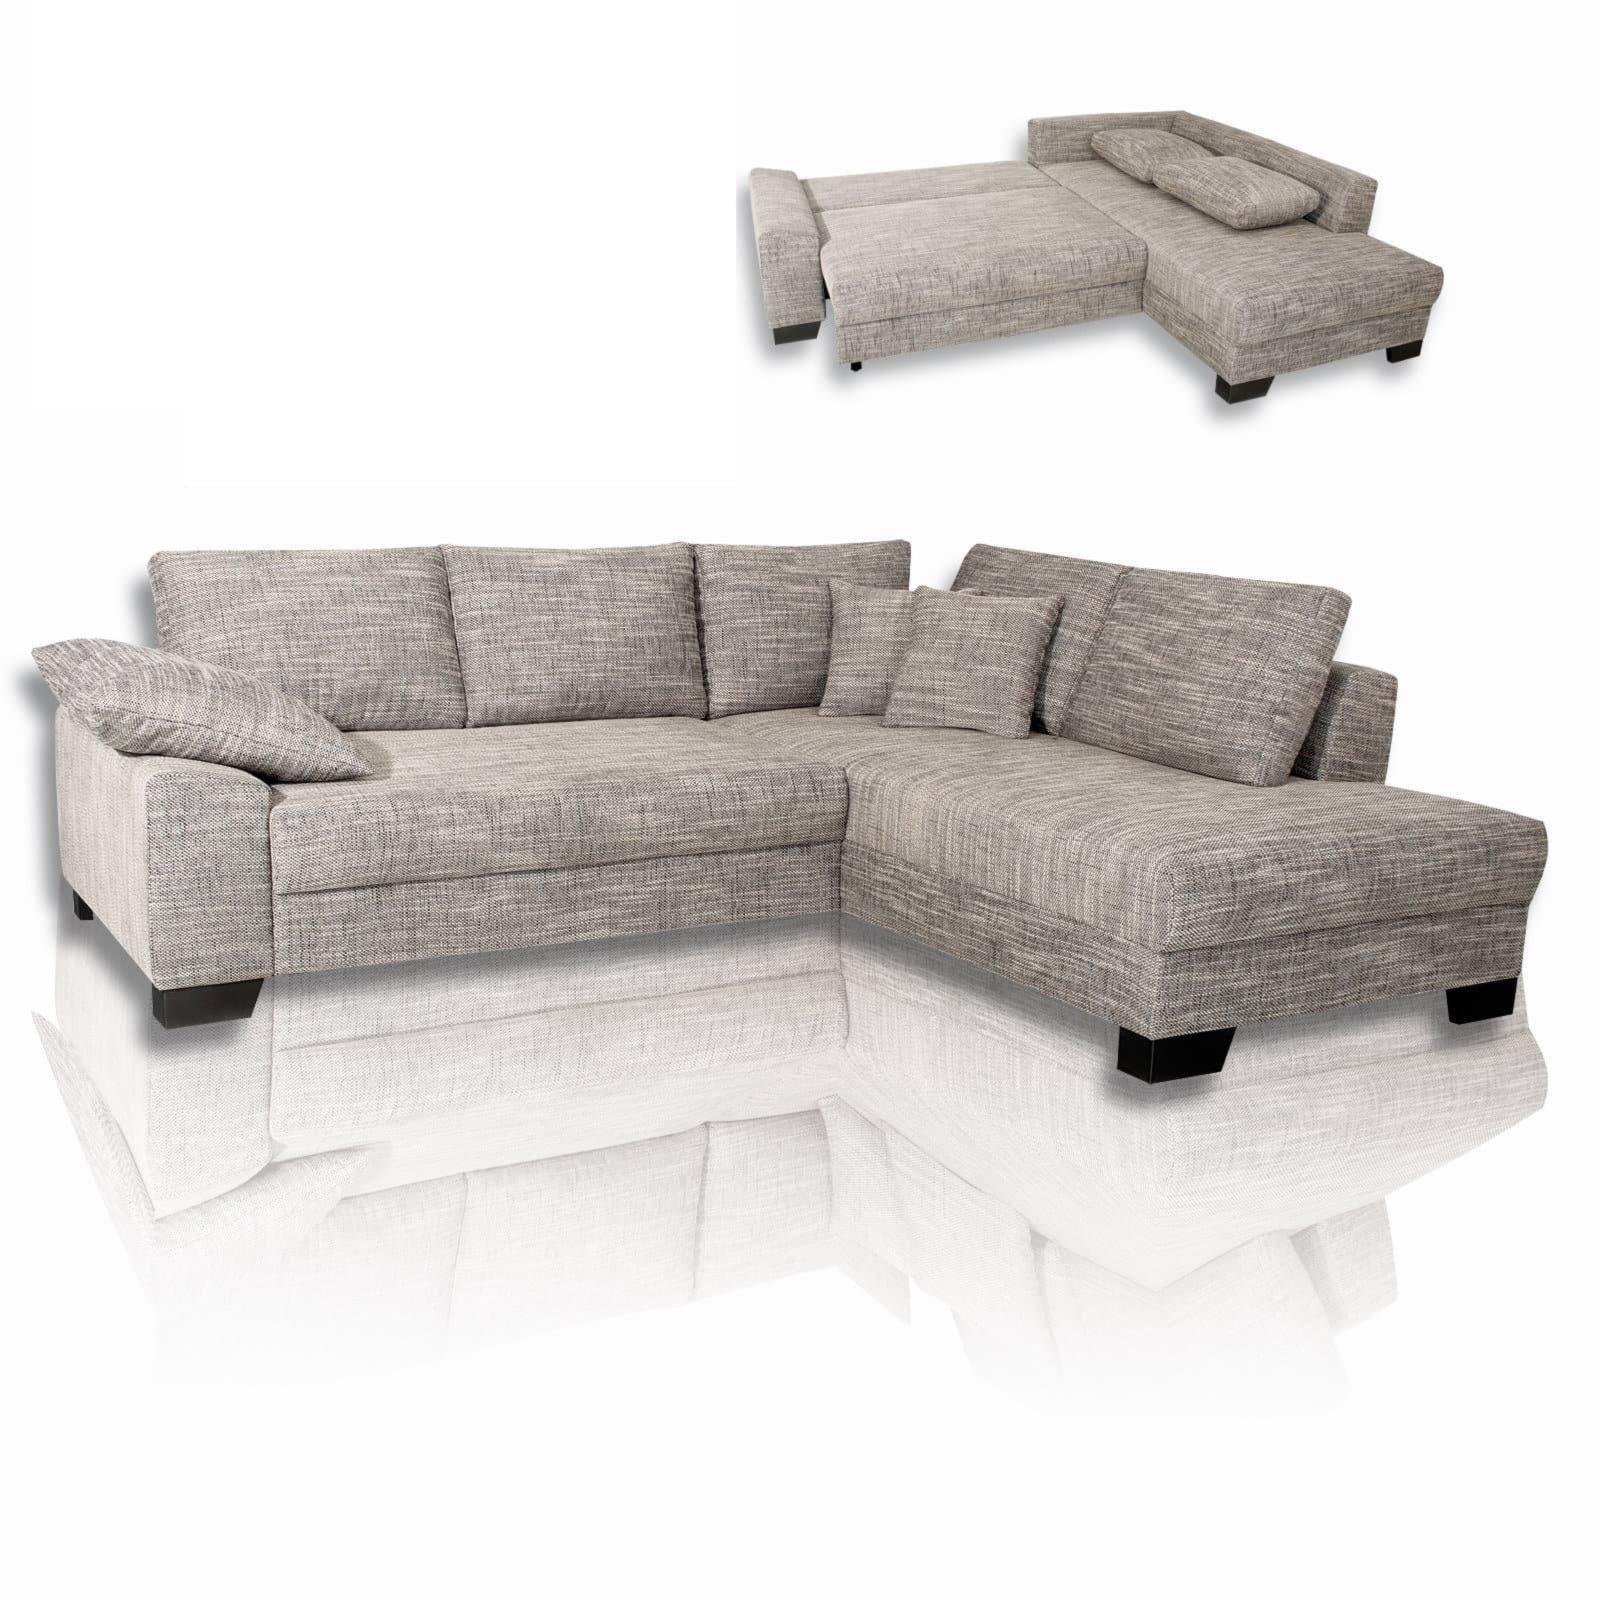 ecksofa grau liegefunktion beidseitig montierbar ecksofas l form sofas couches. Black Bedroom Furniture Sets. Home Design Ideas